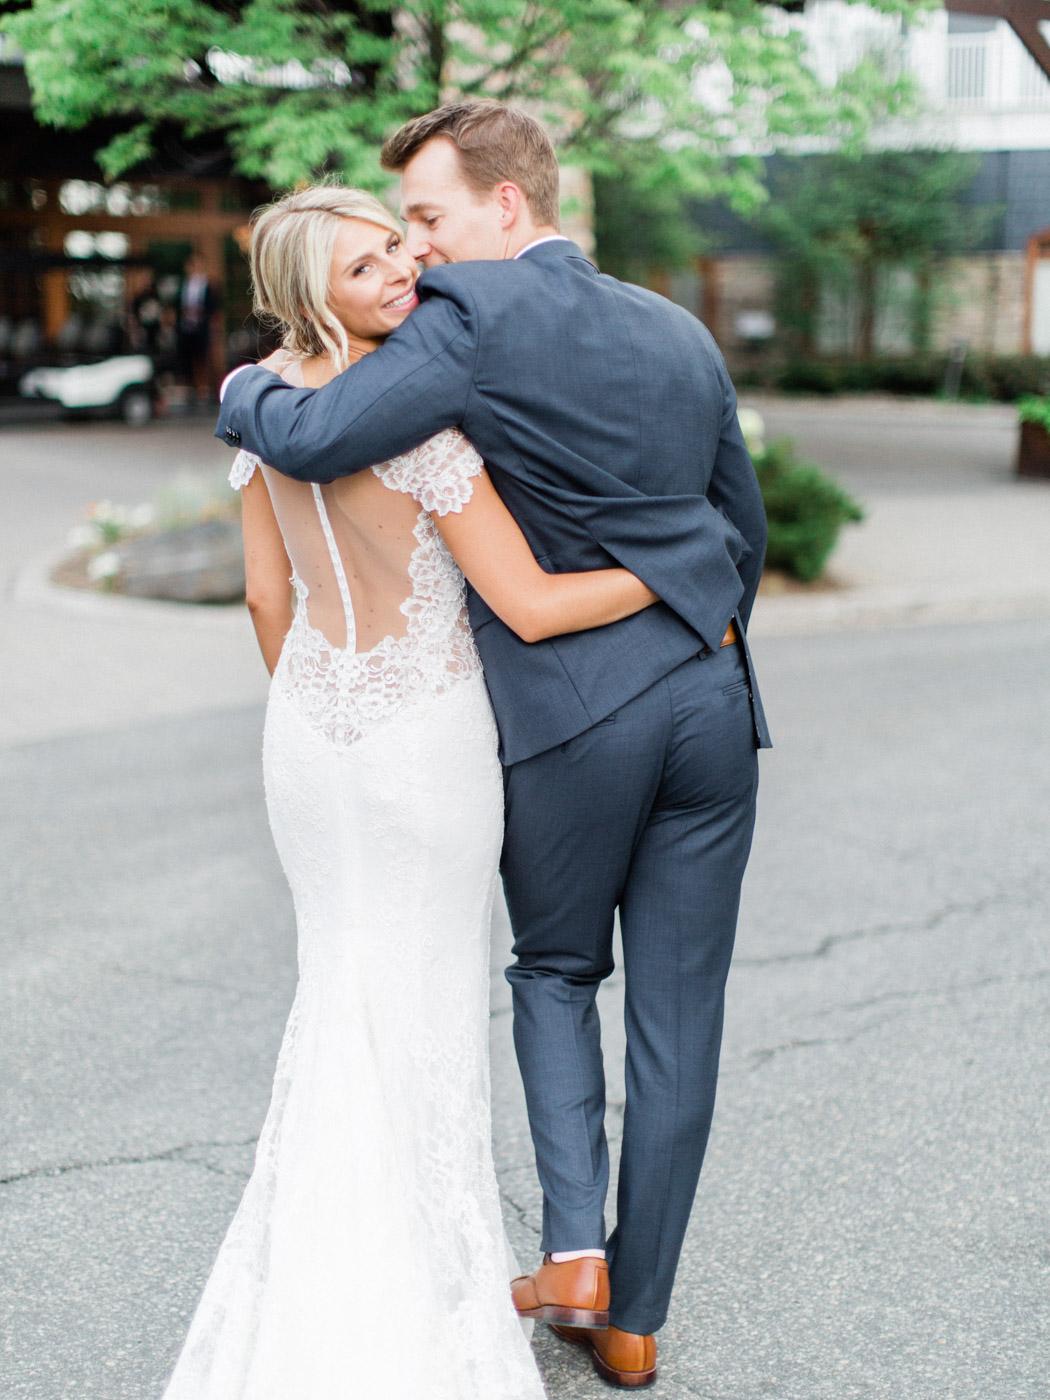 Toronto-Muskoka-wedding-photographer-summery-fun-documentary-the-marriott-rosseau104.jpg